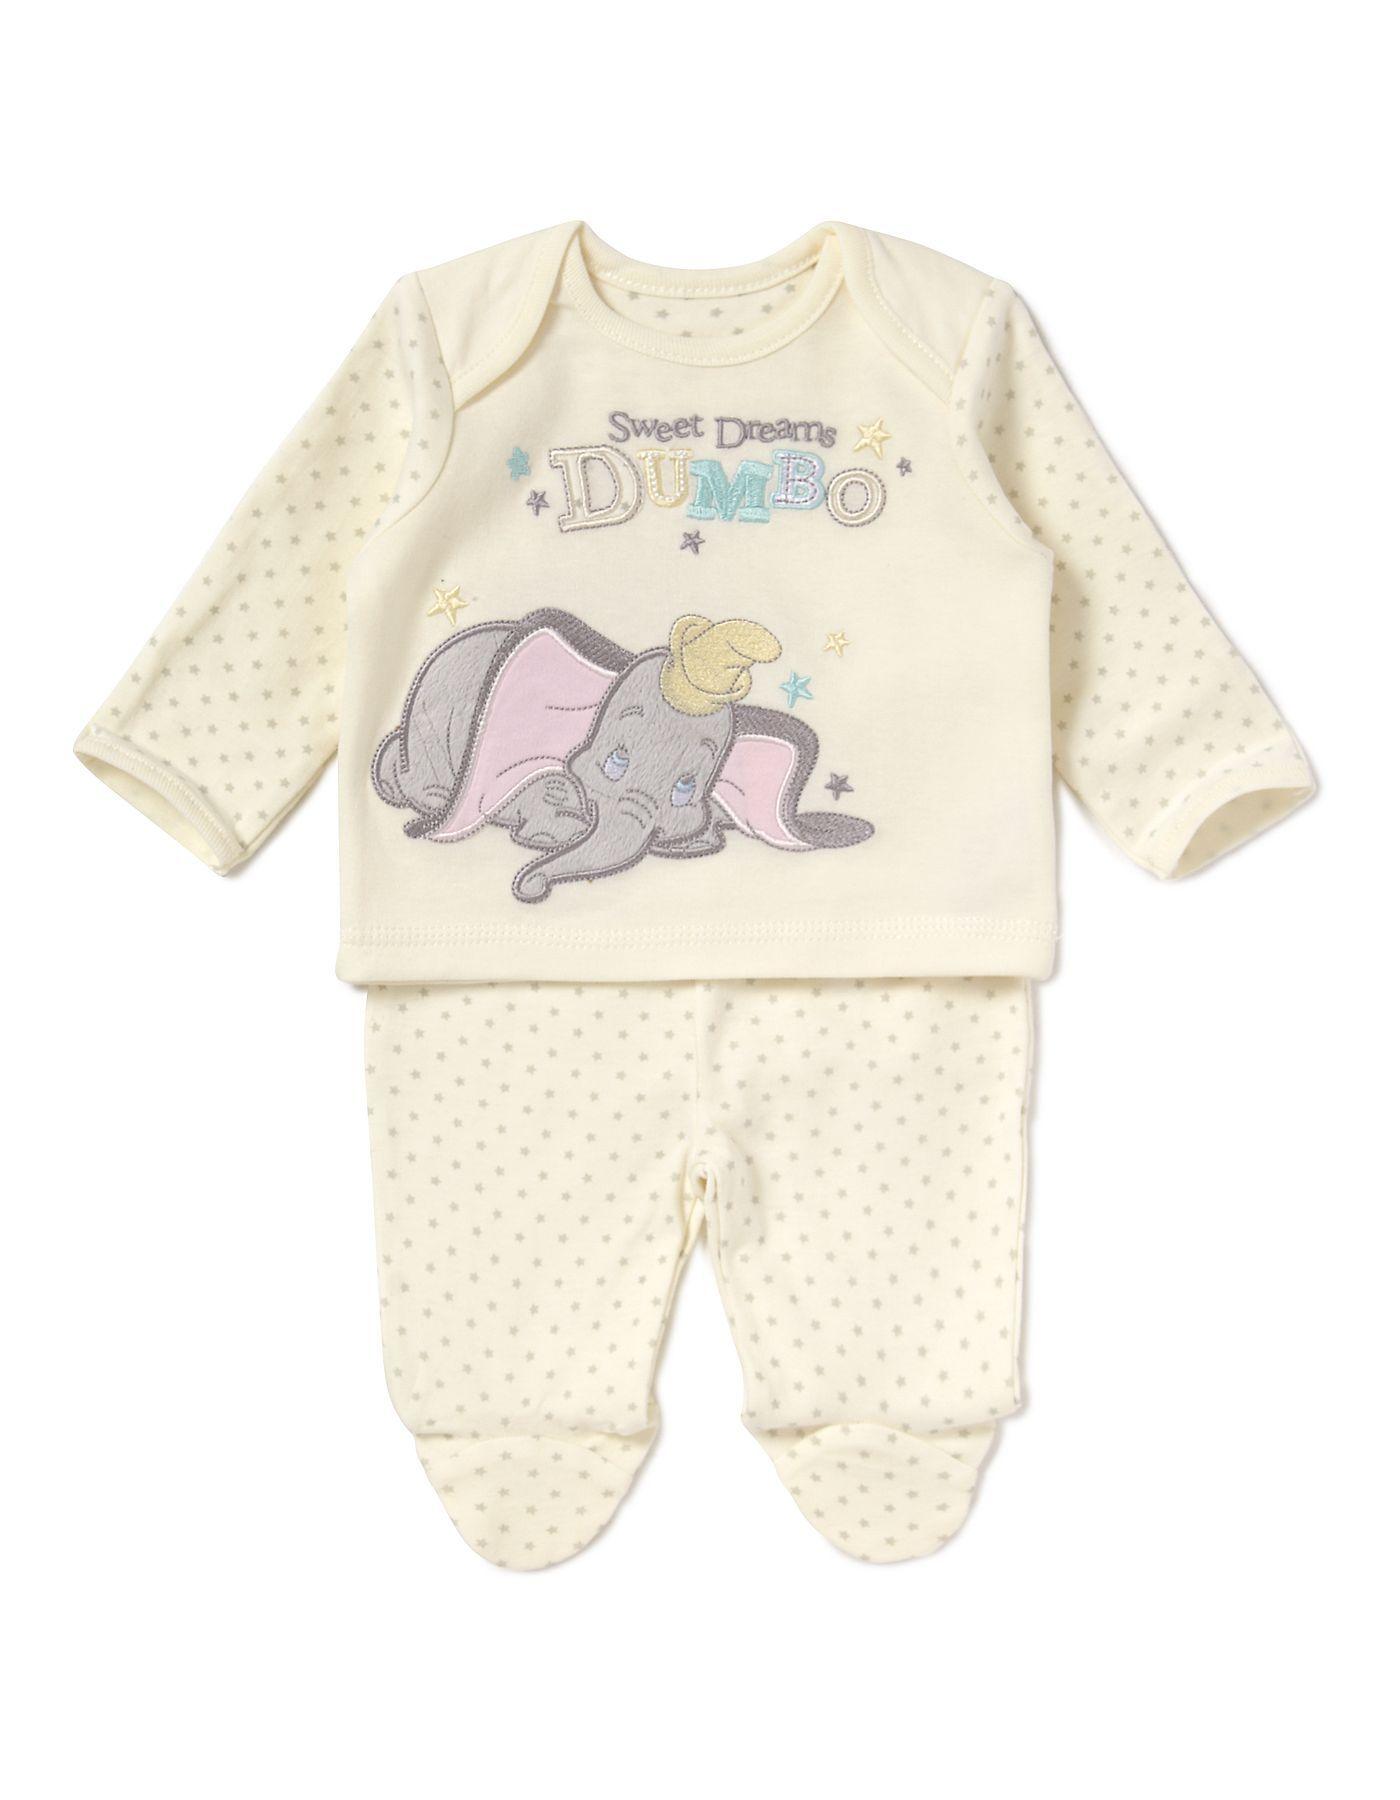 Dumbo pyjamas baby george at asda baby mine 3 pinterest dumbo pyjamas baby george at asda negle Image collections